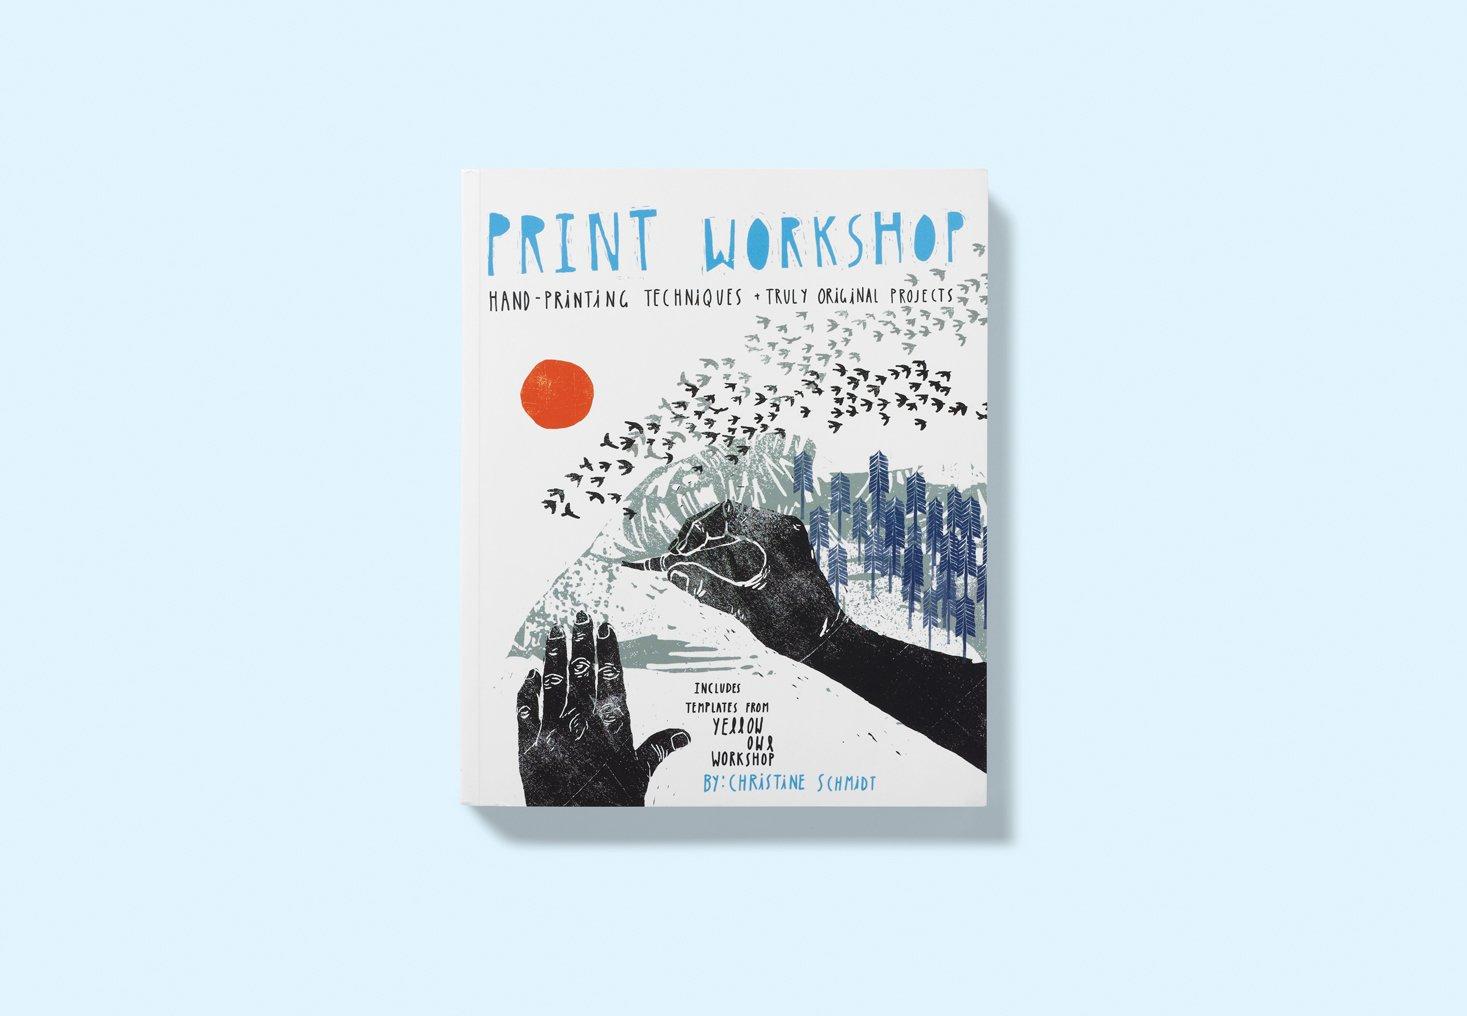 Photo 3 of 3 in Print Workshop